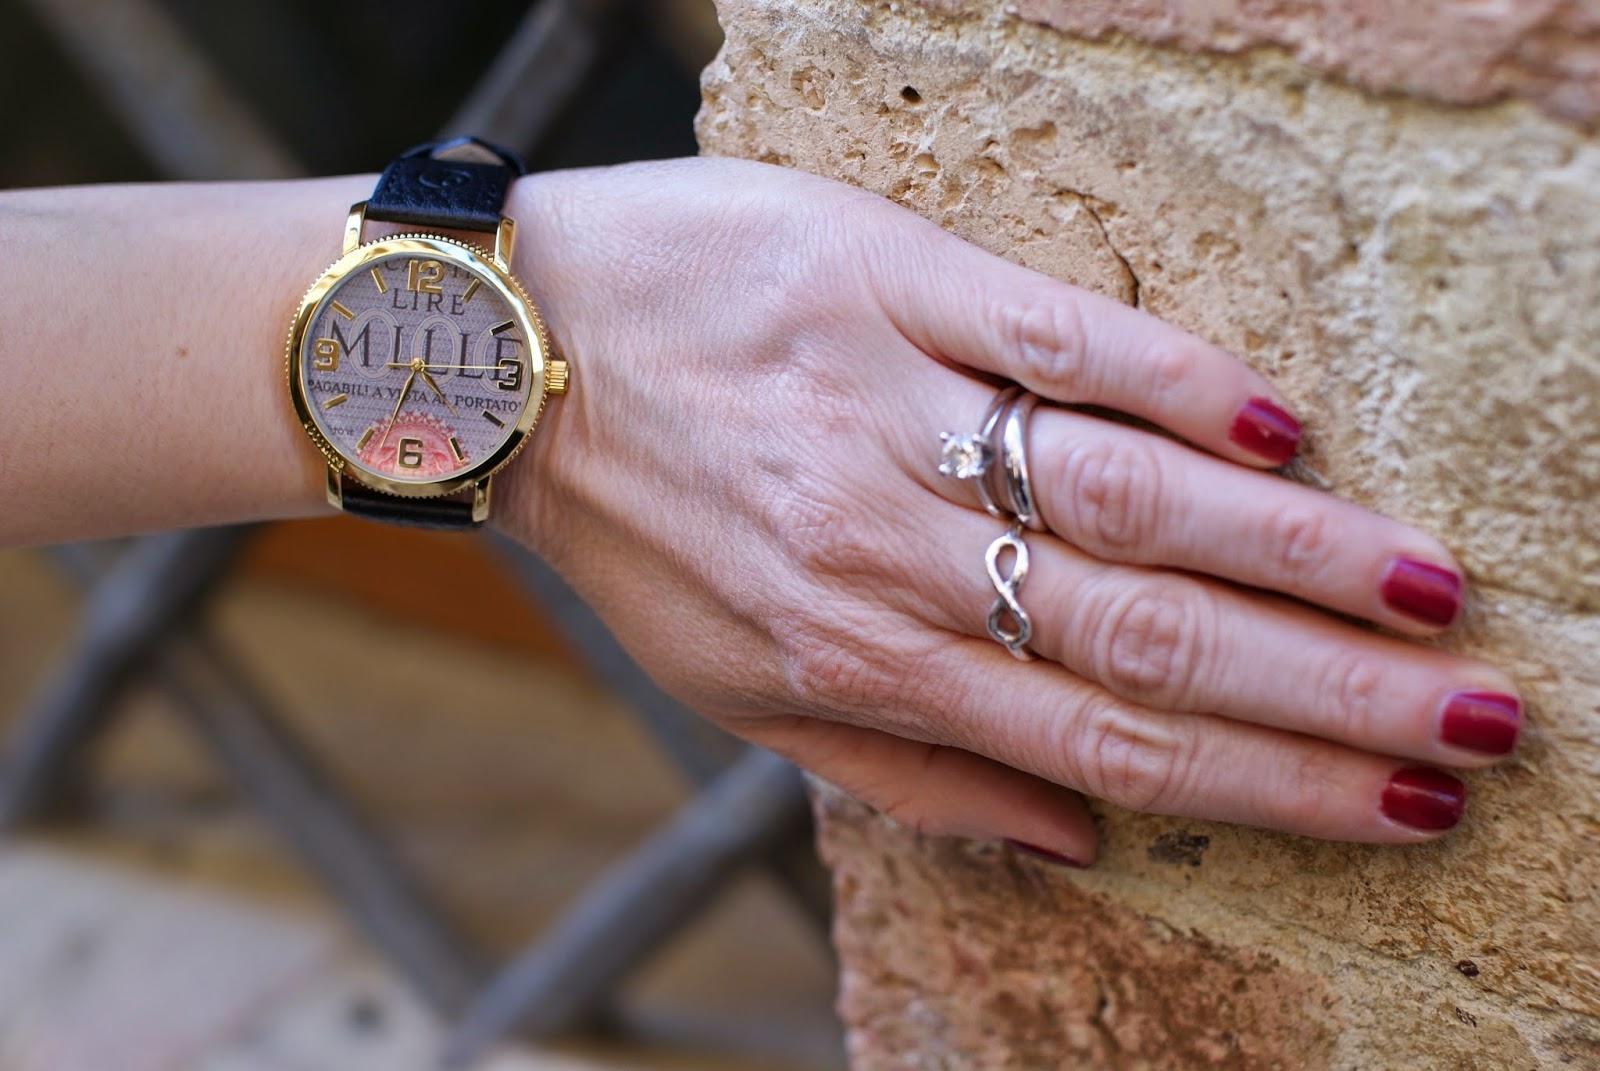 Chanel coup de coeur nail polish, Millelire Giuseppe Verdi orologio, Spadarella infinity ring, Fashion and Cookies, fashion blogger